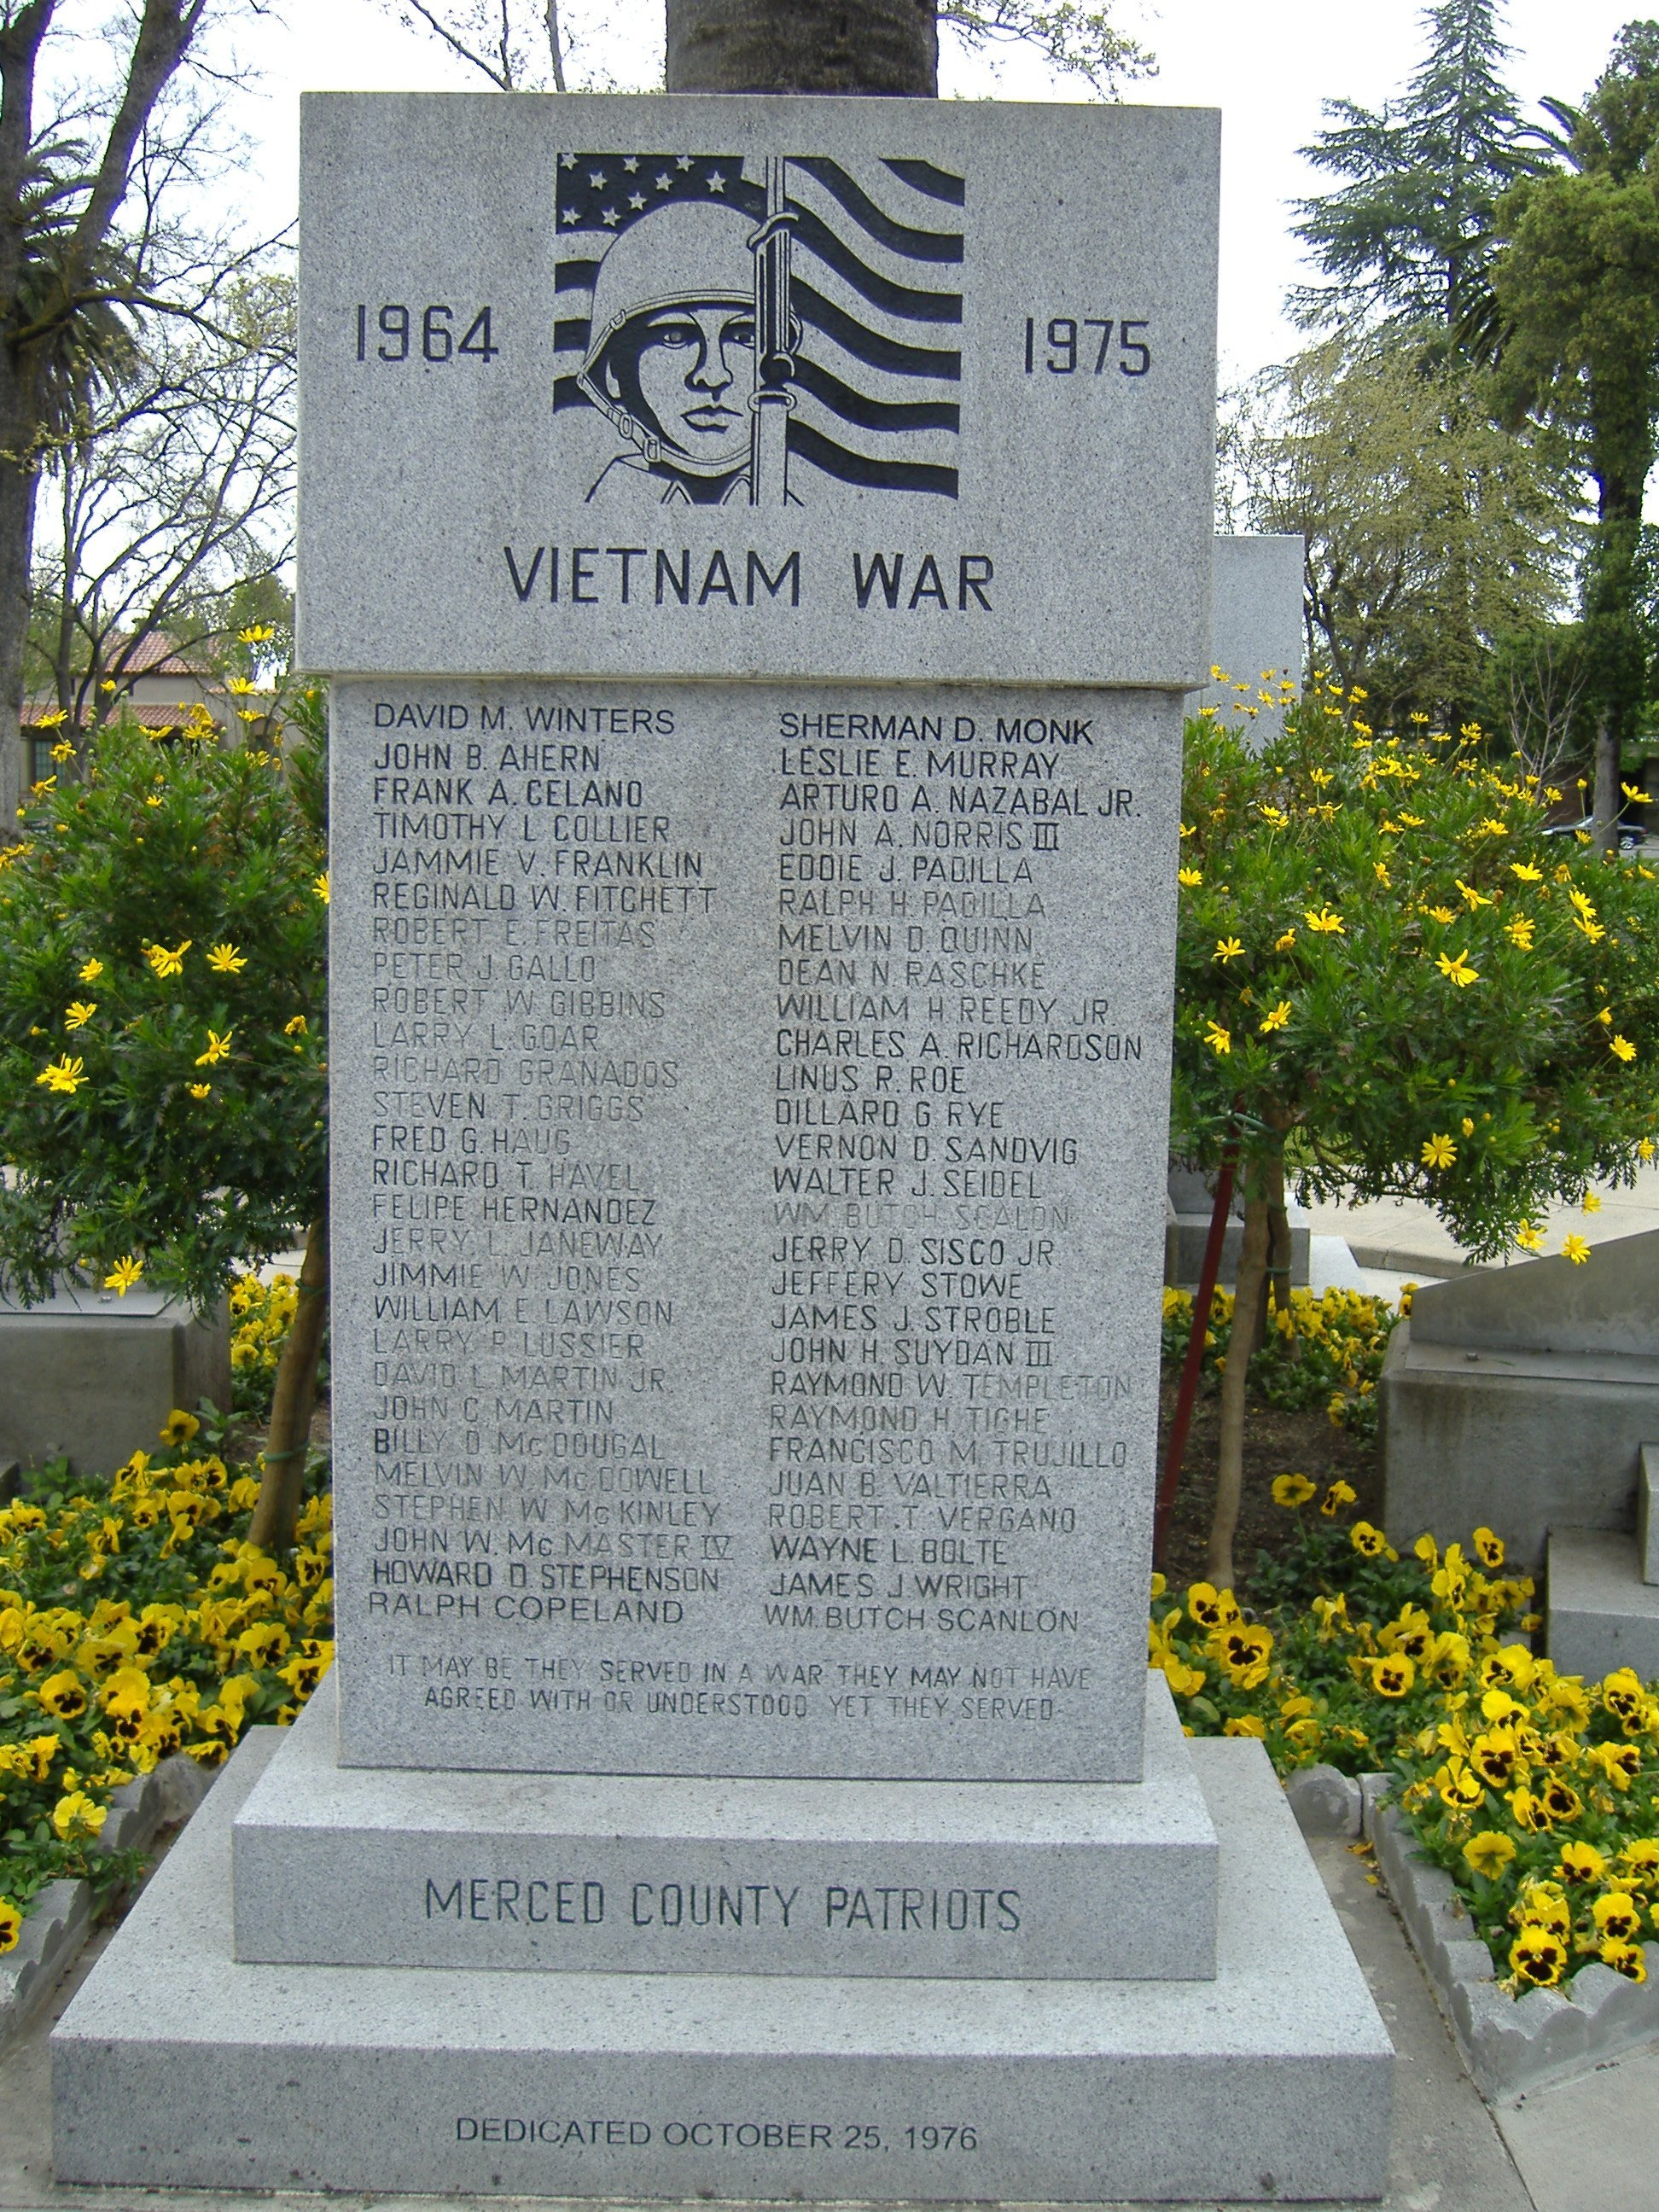 Persuasive essay on the vietnam war